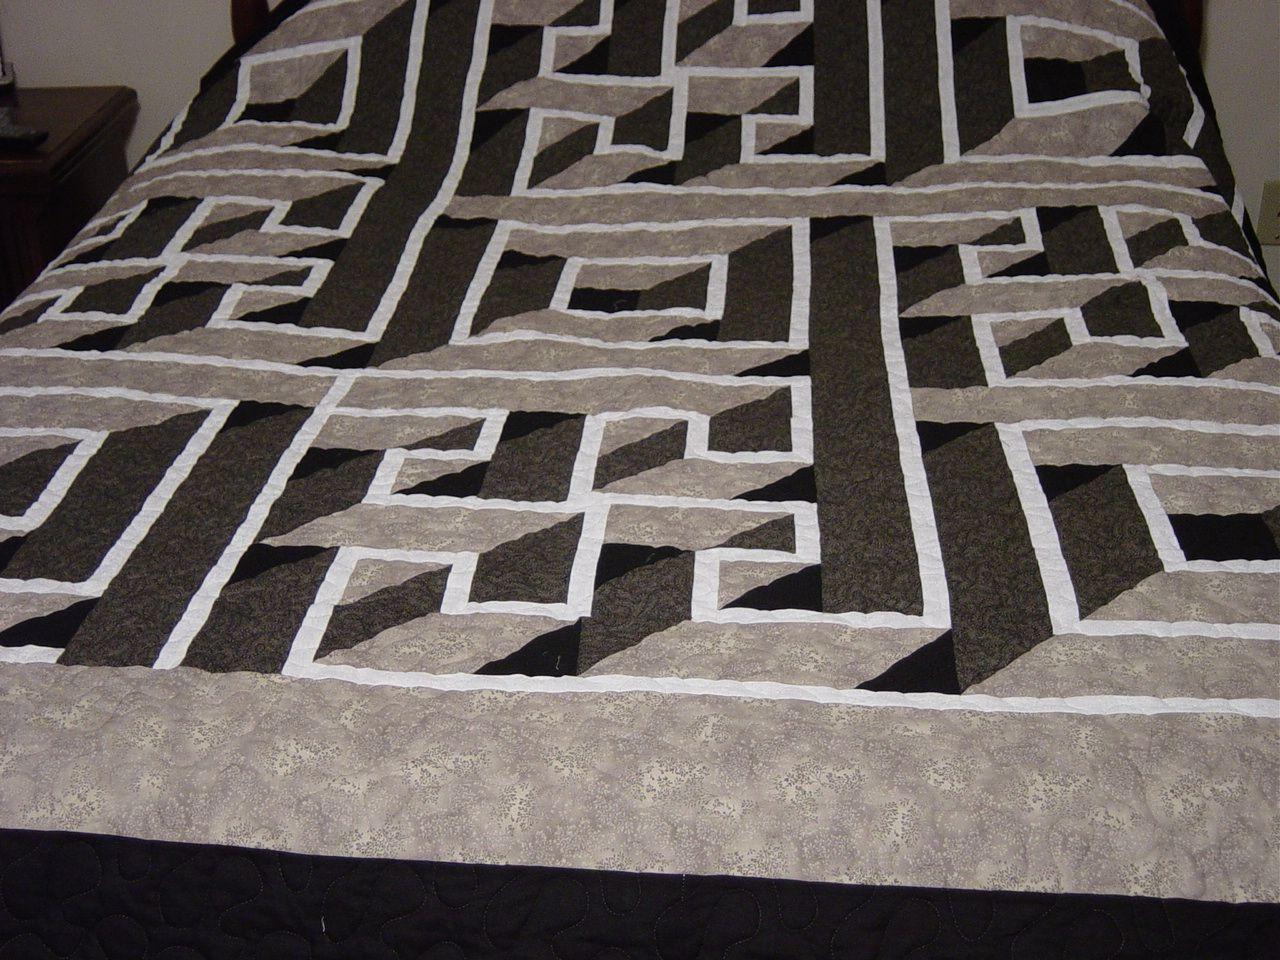 Square Labyrinth Pattern   Grandson quilt ideas   Pinterest ... : free labyrinth quilt pattern - Adamdwight.com